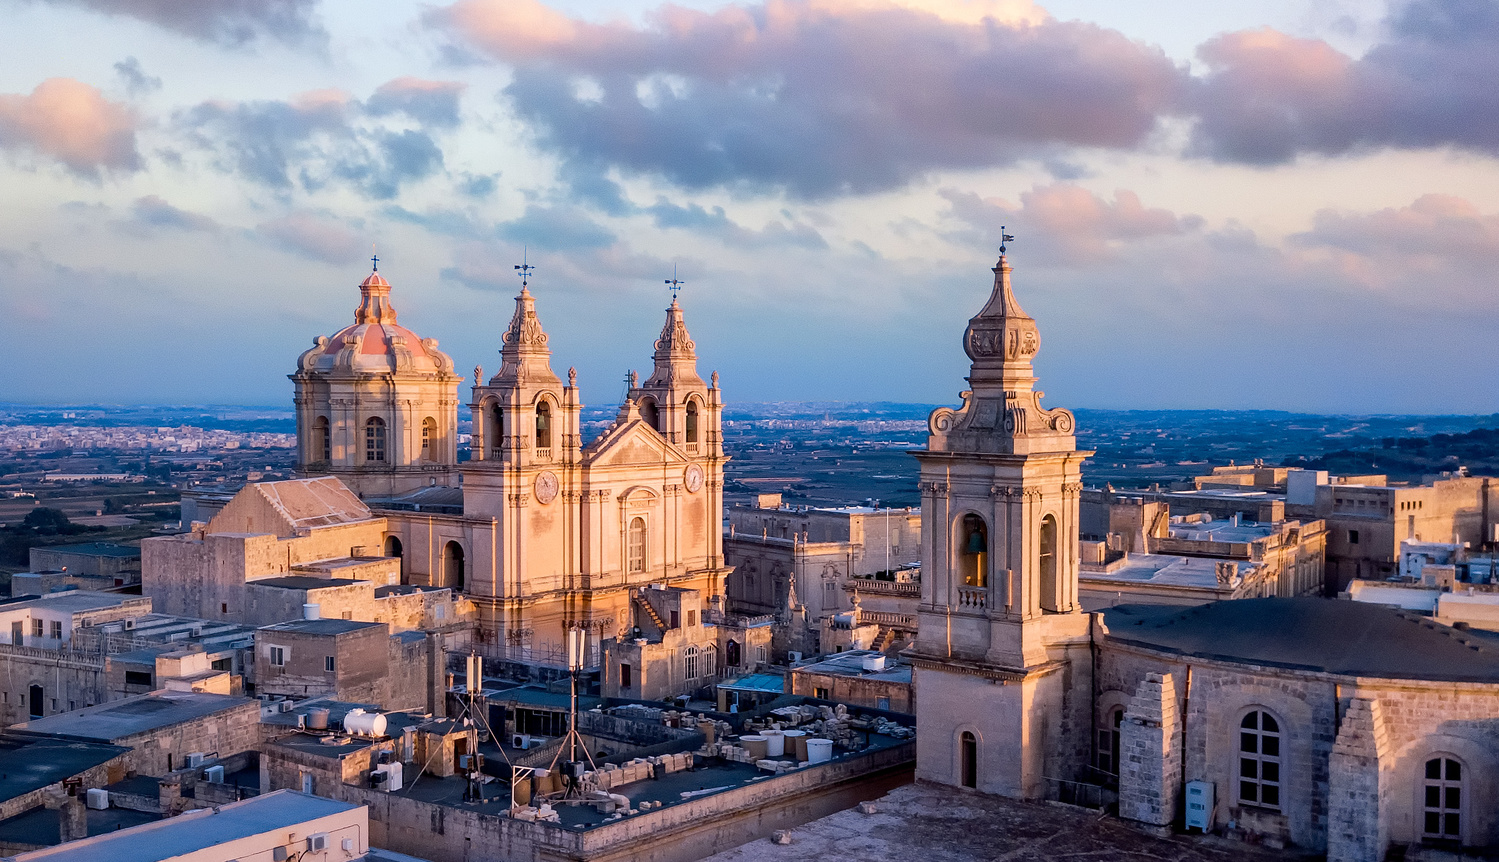 St.Paul Cathedral in Mdina by Mykhailo Nahlii